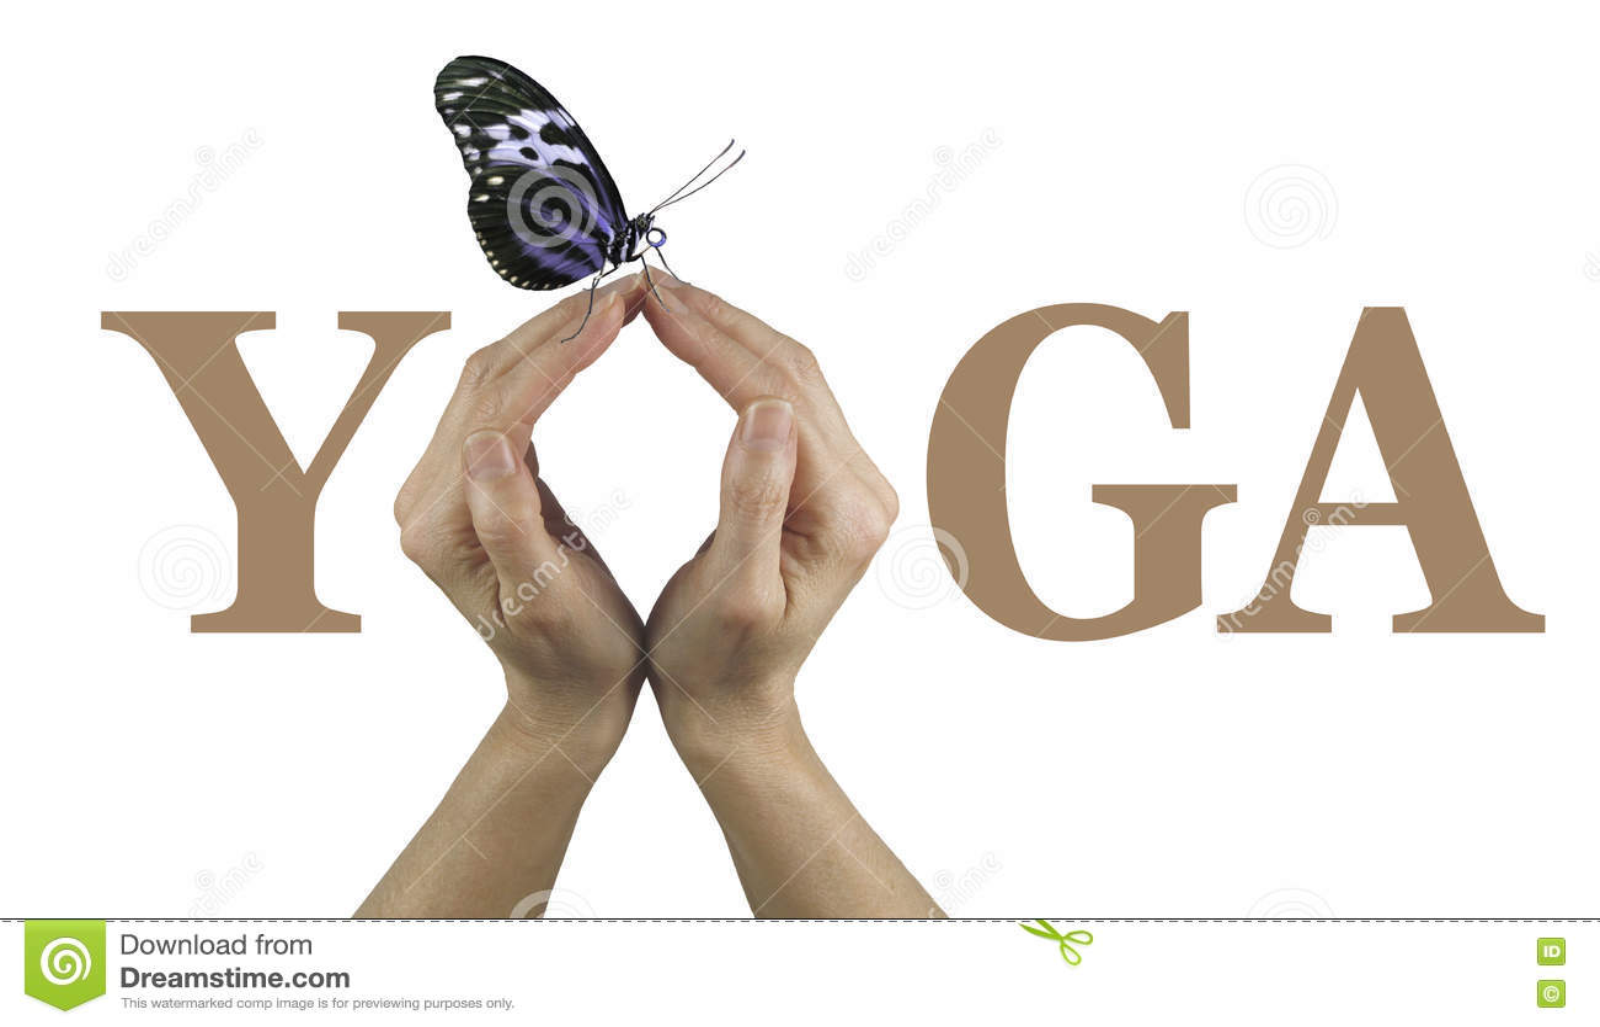 Erbjuda dig yoga